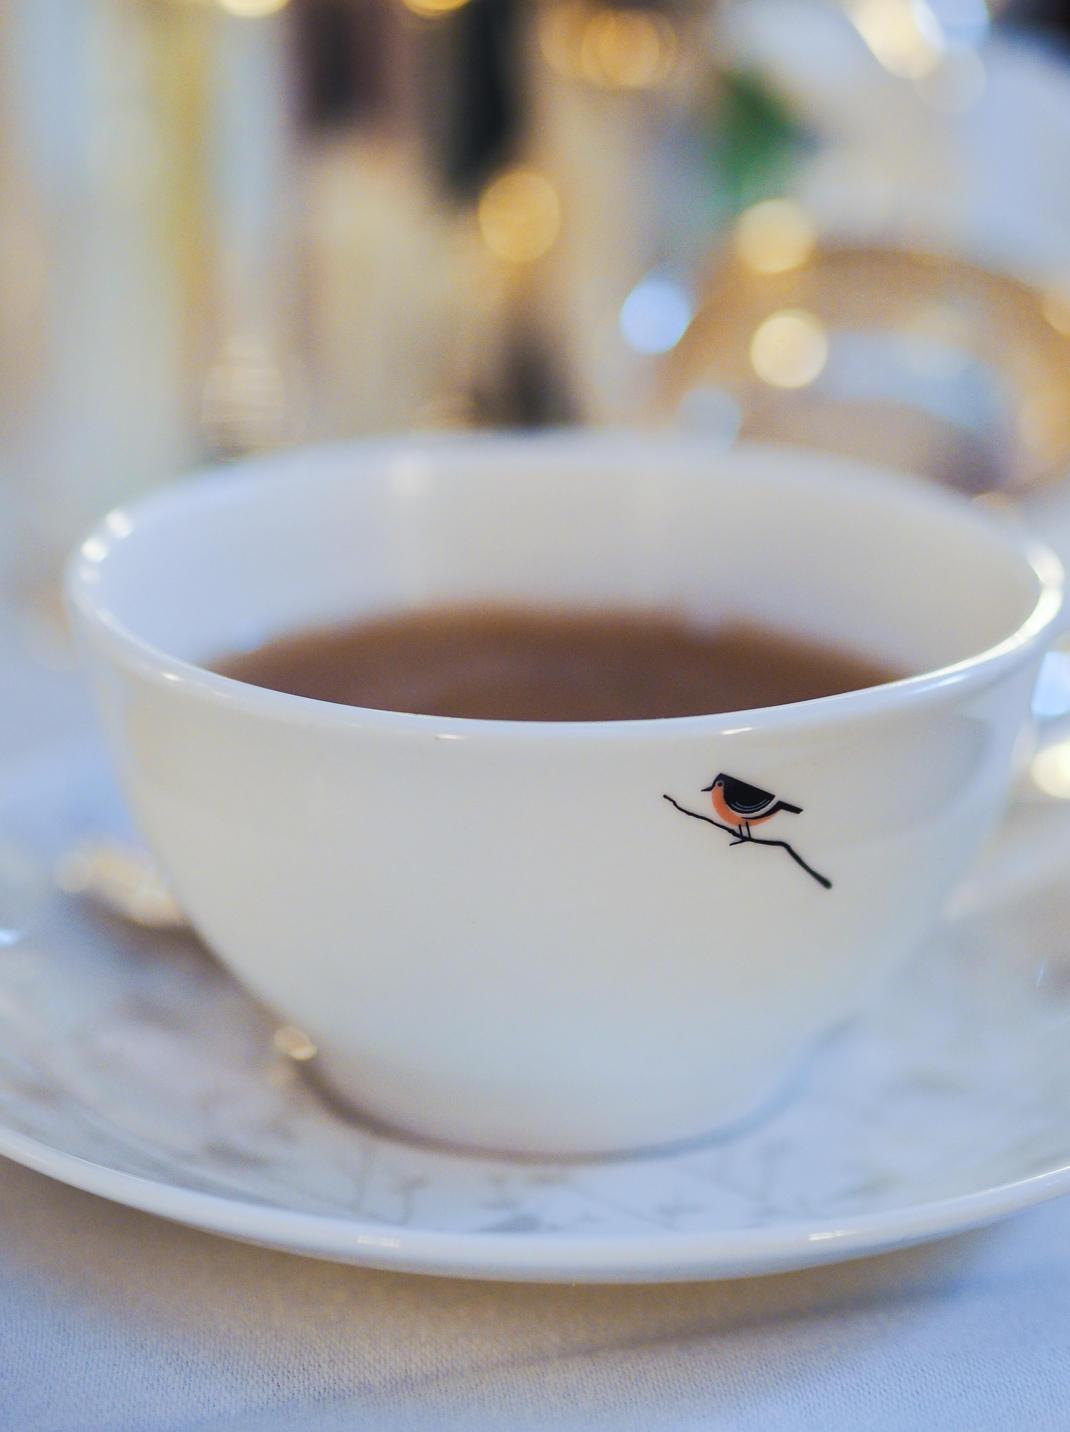 Sheraton Grand dalmation afternoon tea in London